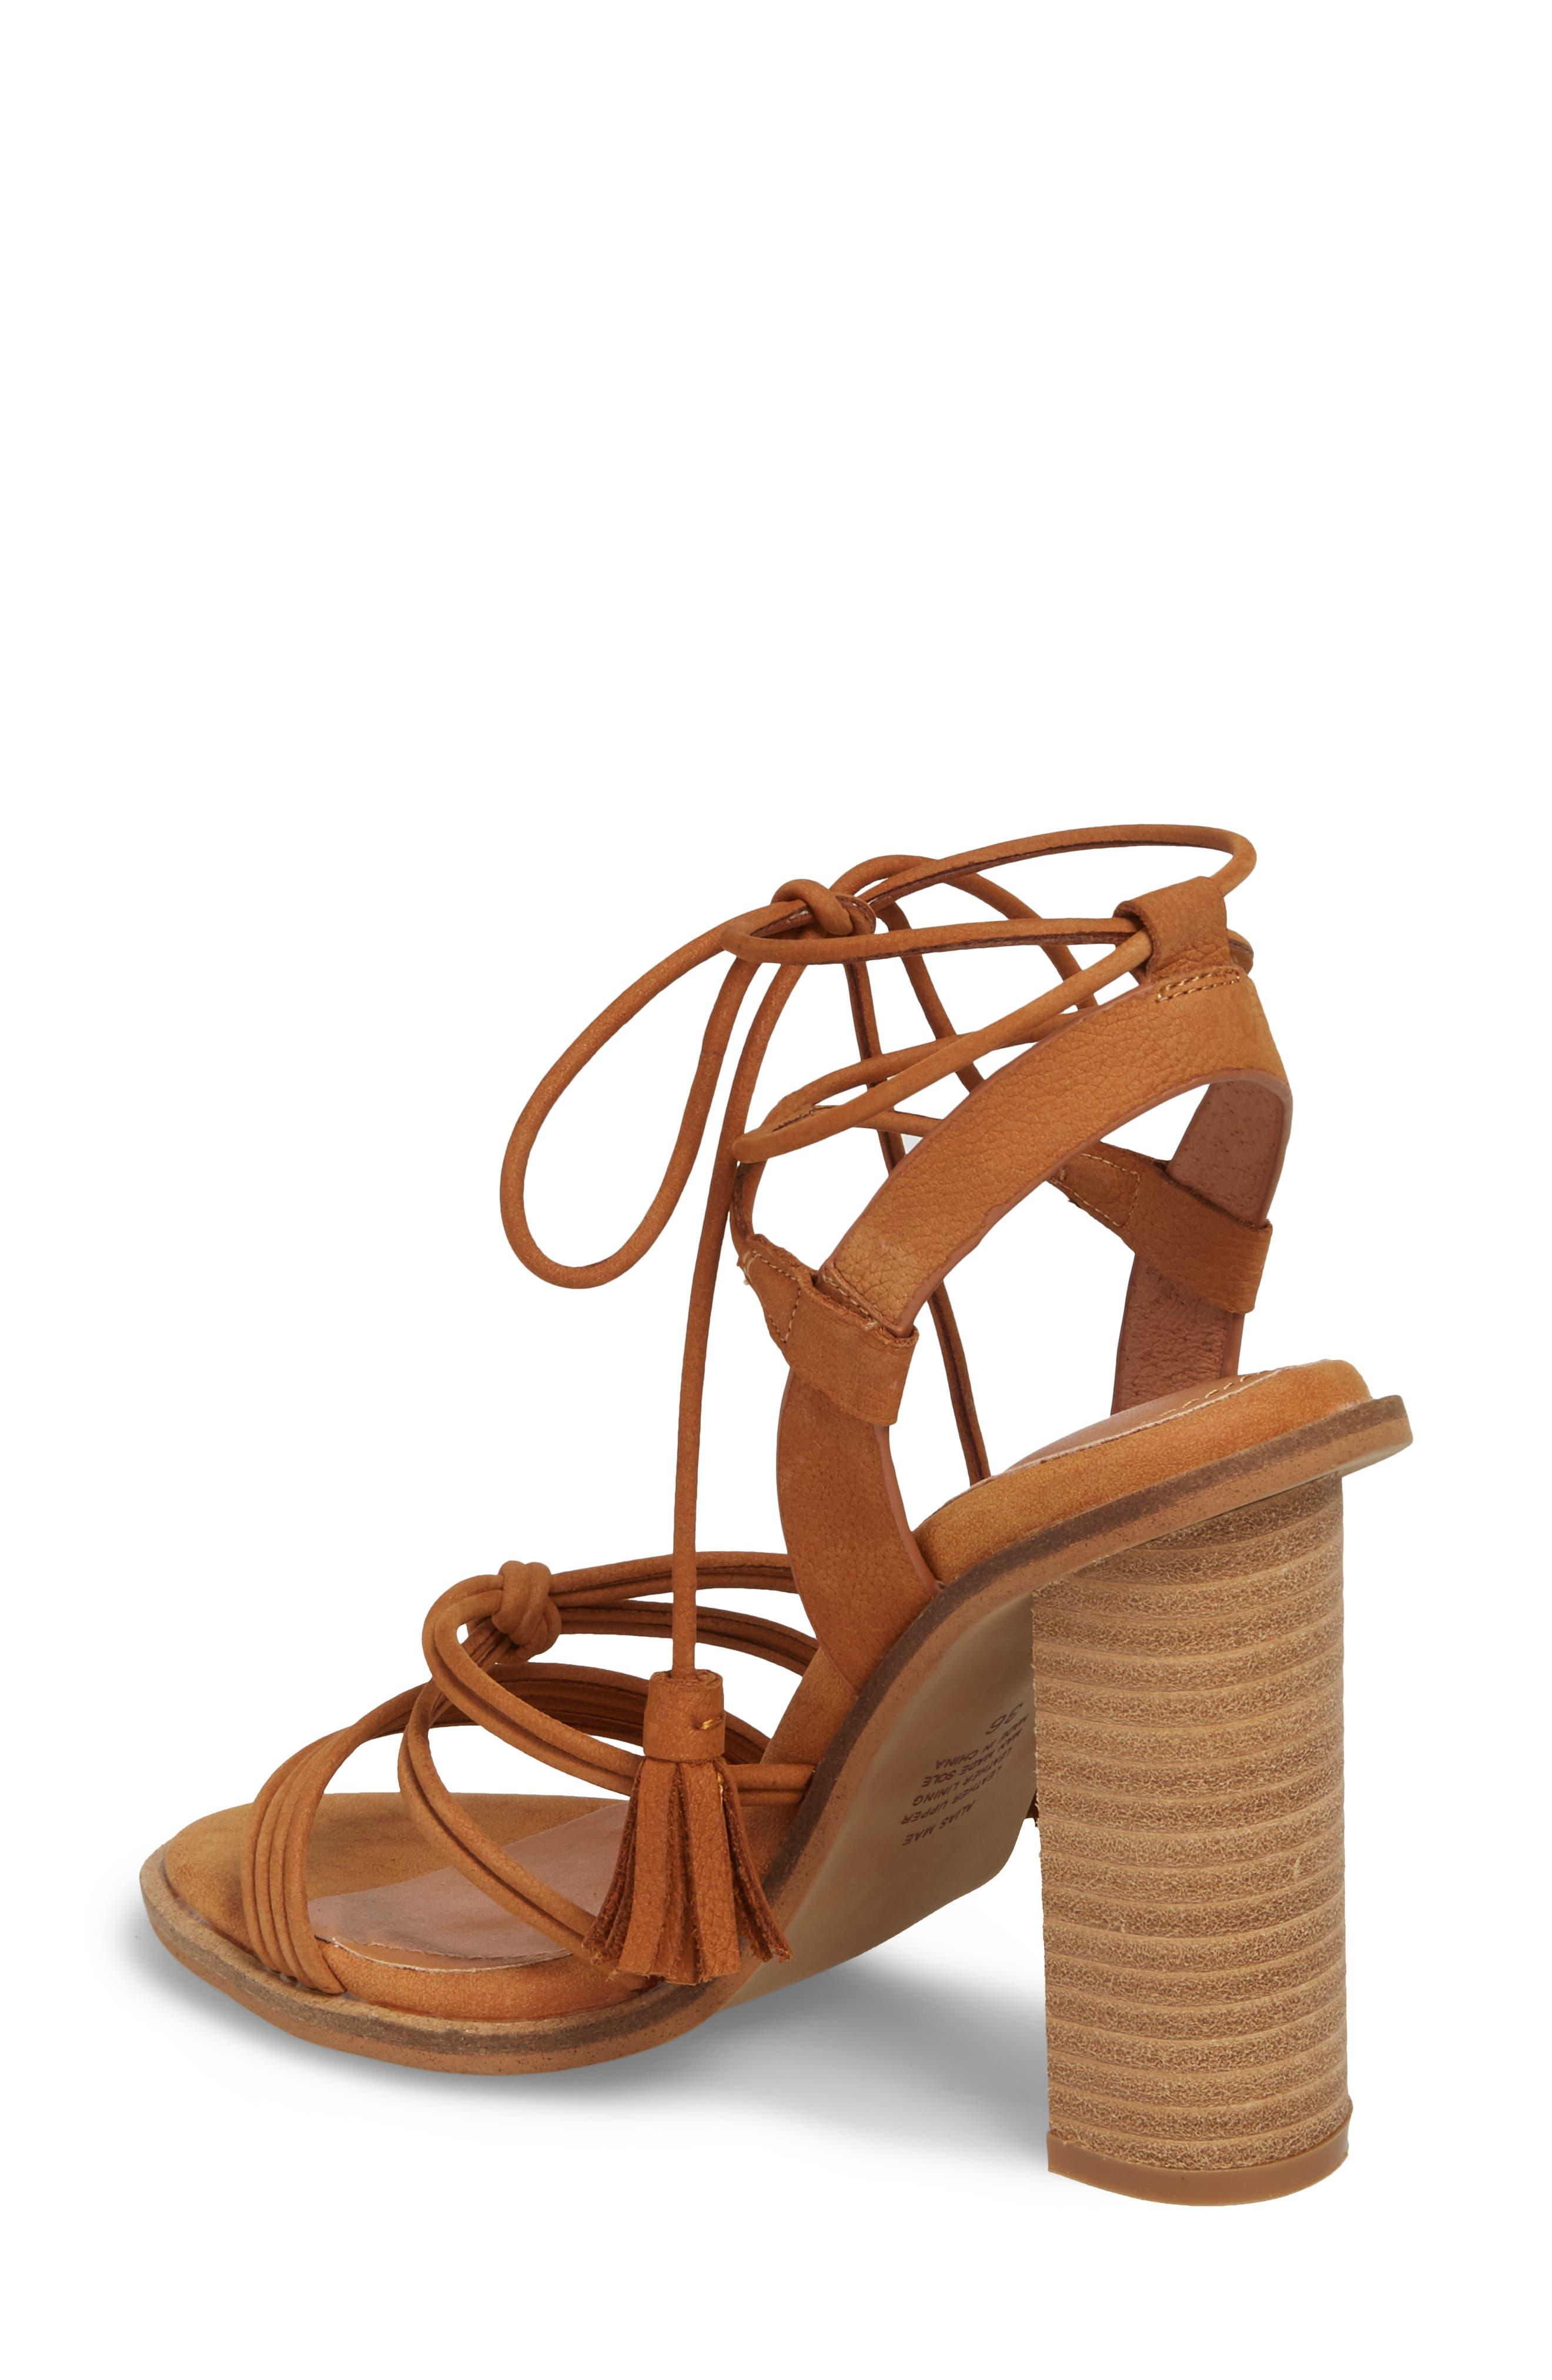 Adagio Sandal,                             Alternate thumbnail 2, color,                             Tan Leather